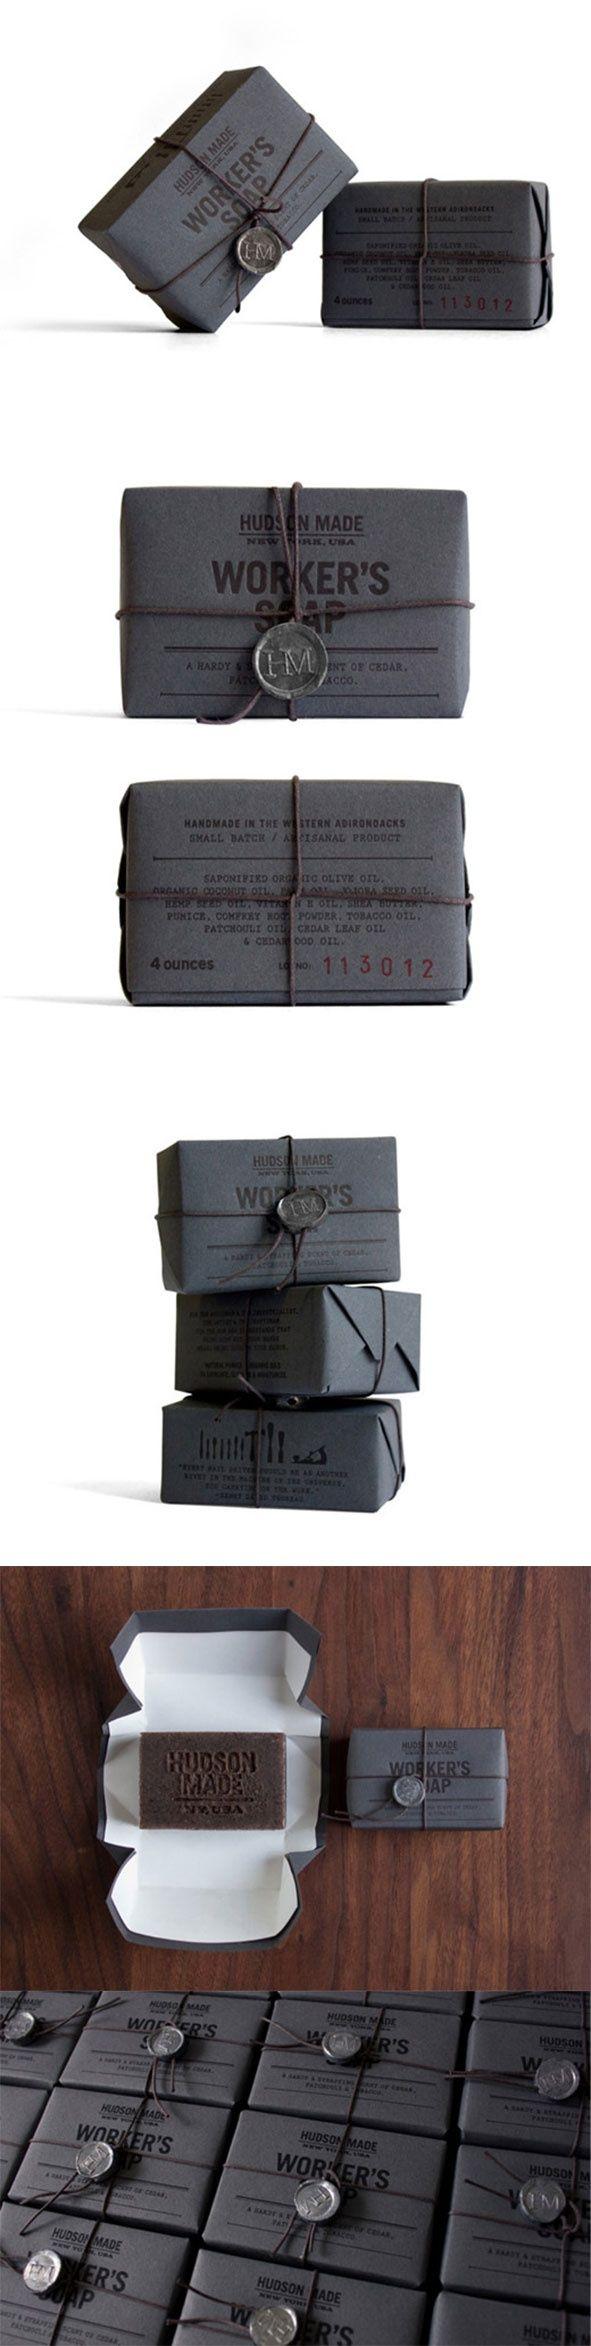 Hudson Made: Worker's Soap $16  #inspiration  Torso Vertical Inspirations Blogging inspirational work, a visual source for Torso Vertical.  Connect with Torso Vertical Branding, advertising & Illustration  www.facebook.com/TorsoVerticalDesign /torsovertical/ http://www.torsovertical.com